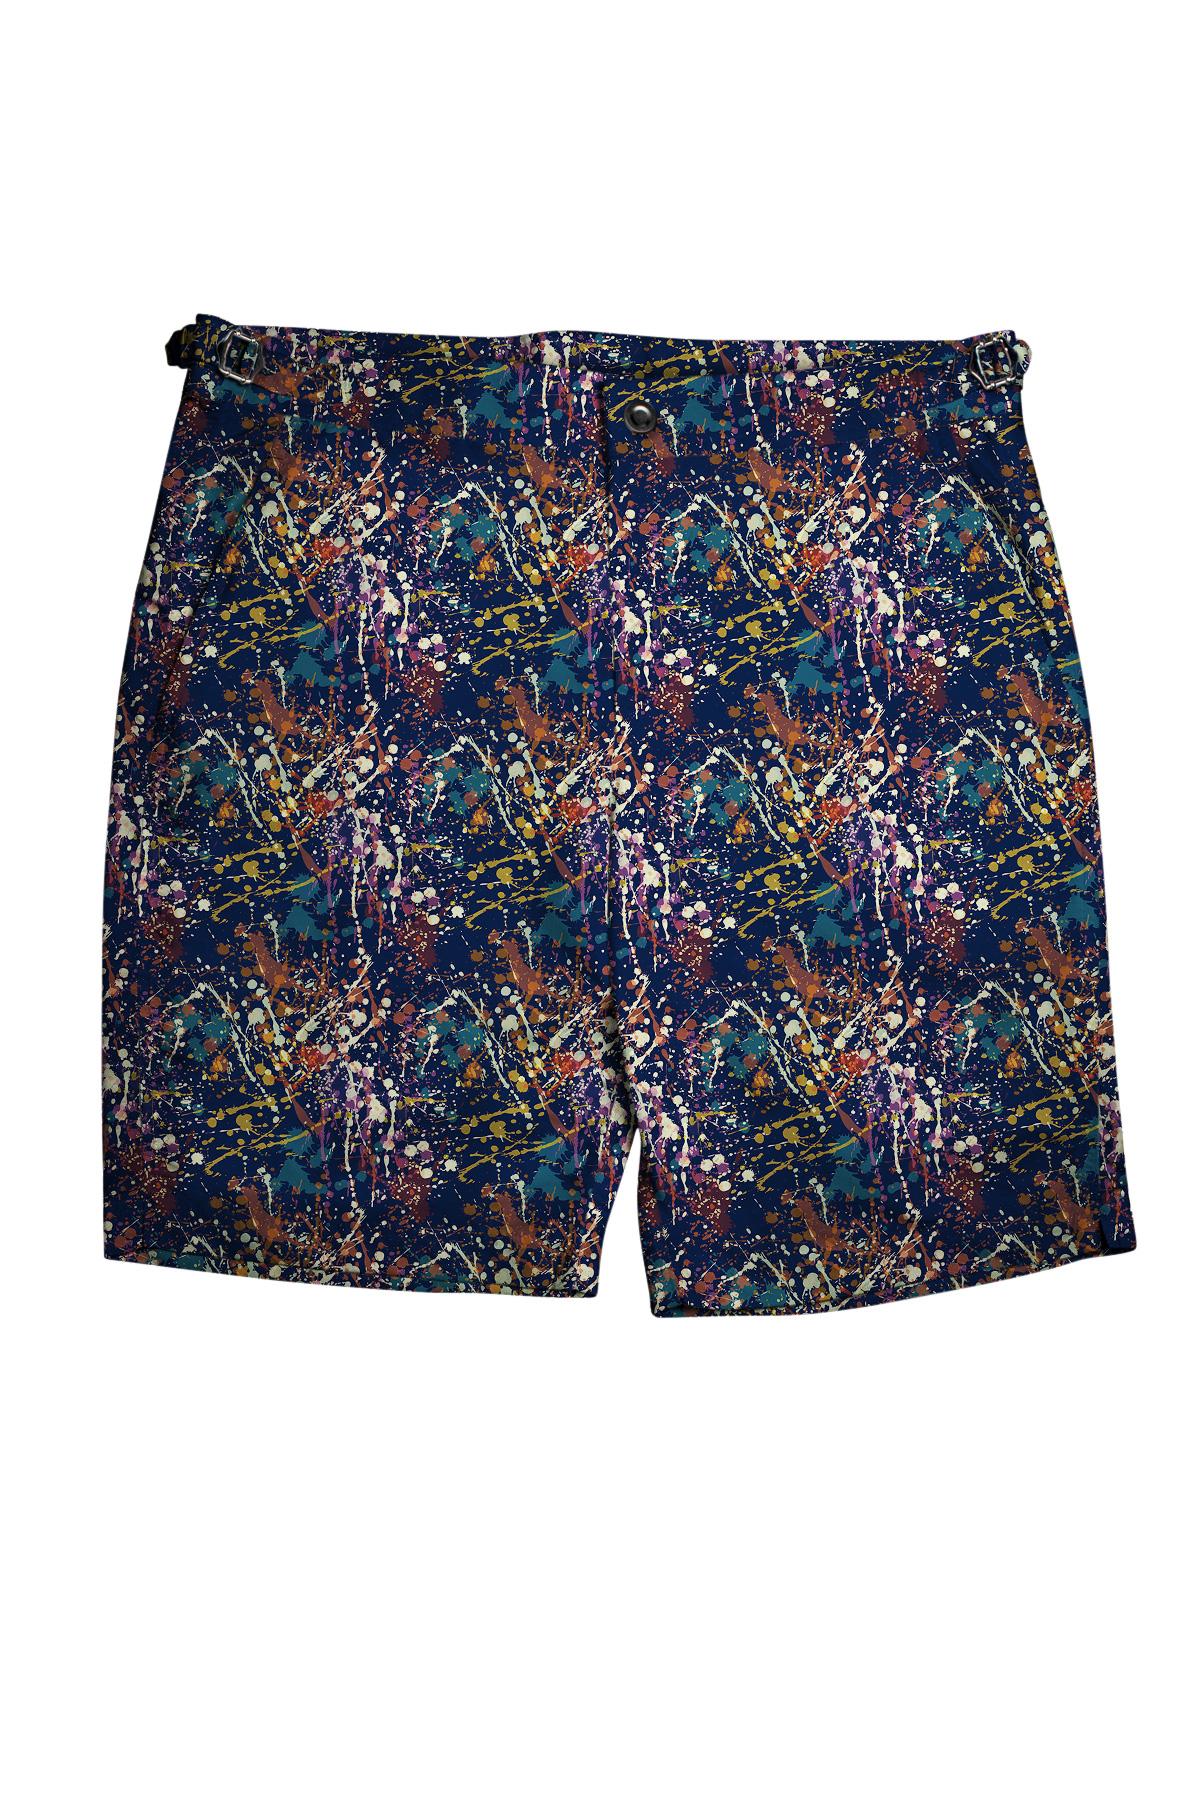 Navy Paint Splatters Swim Shorts